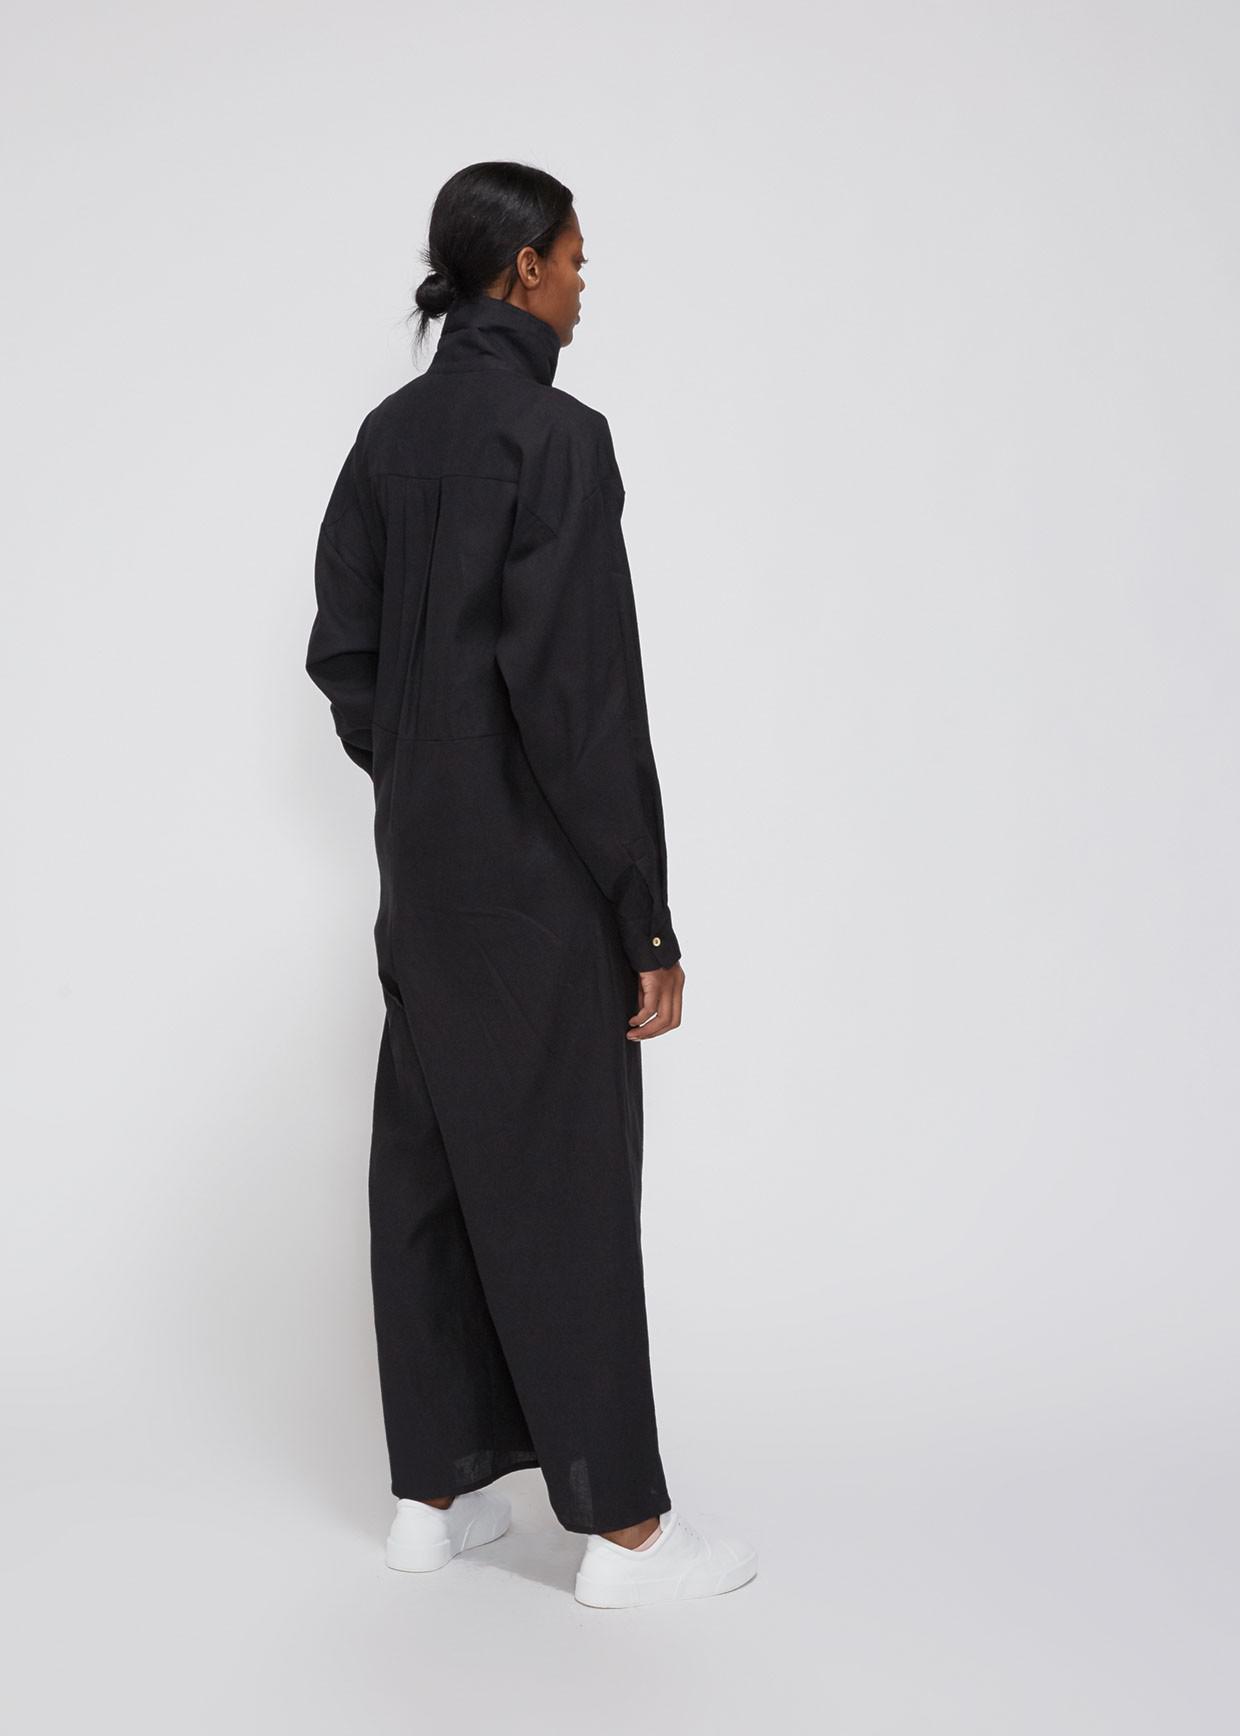 6eebd9a8b60b Baserange - Black Aorta Linen Jumpsuit - Lyst. View fullscreen